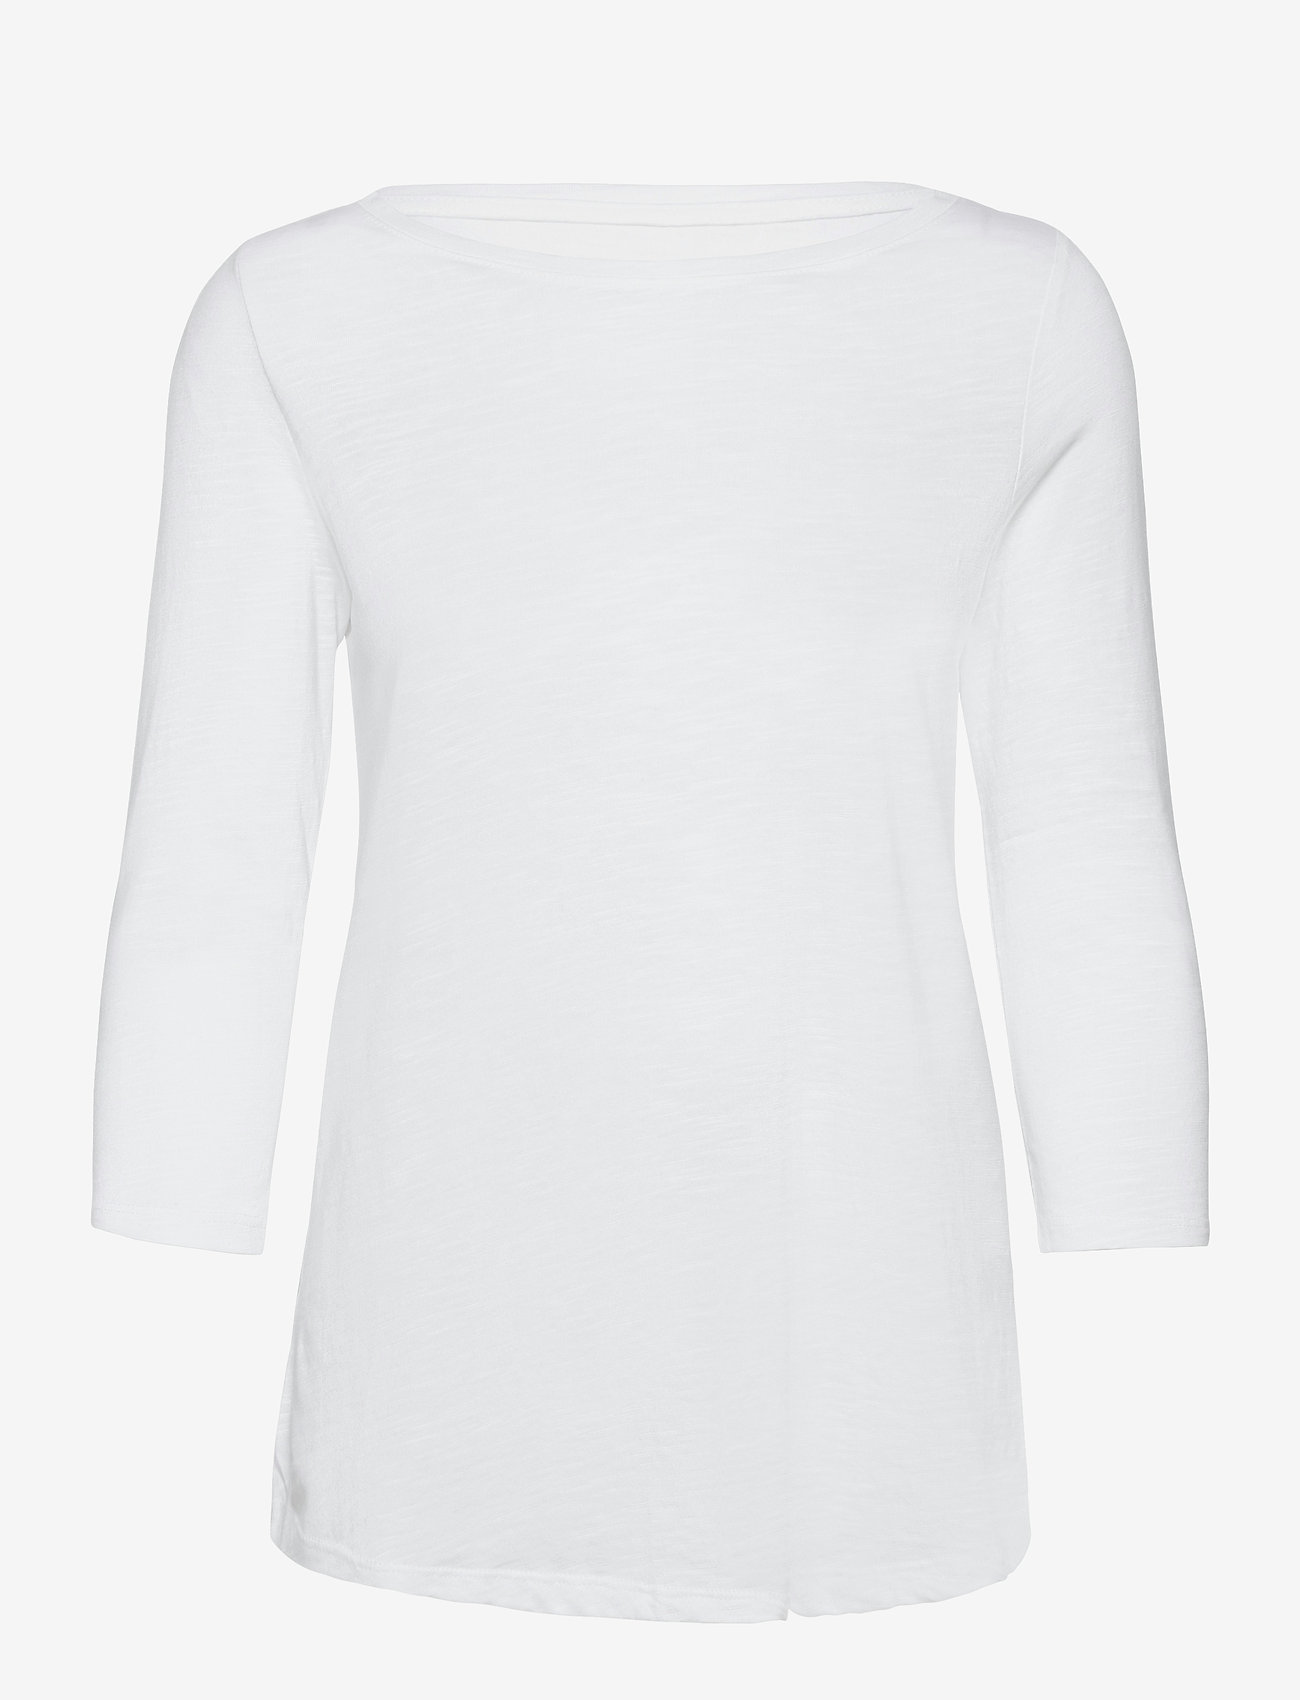 Esprit Casual - T-Shirts - t-shirt & tops - white - 0